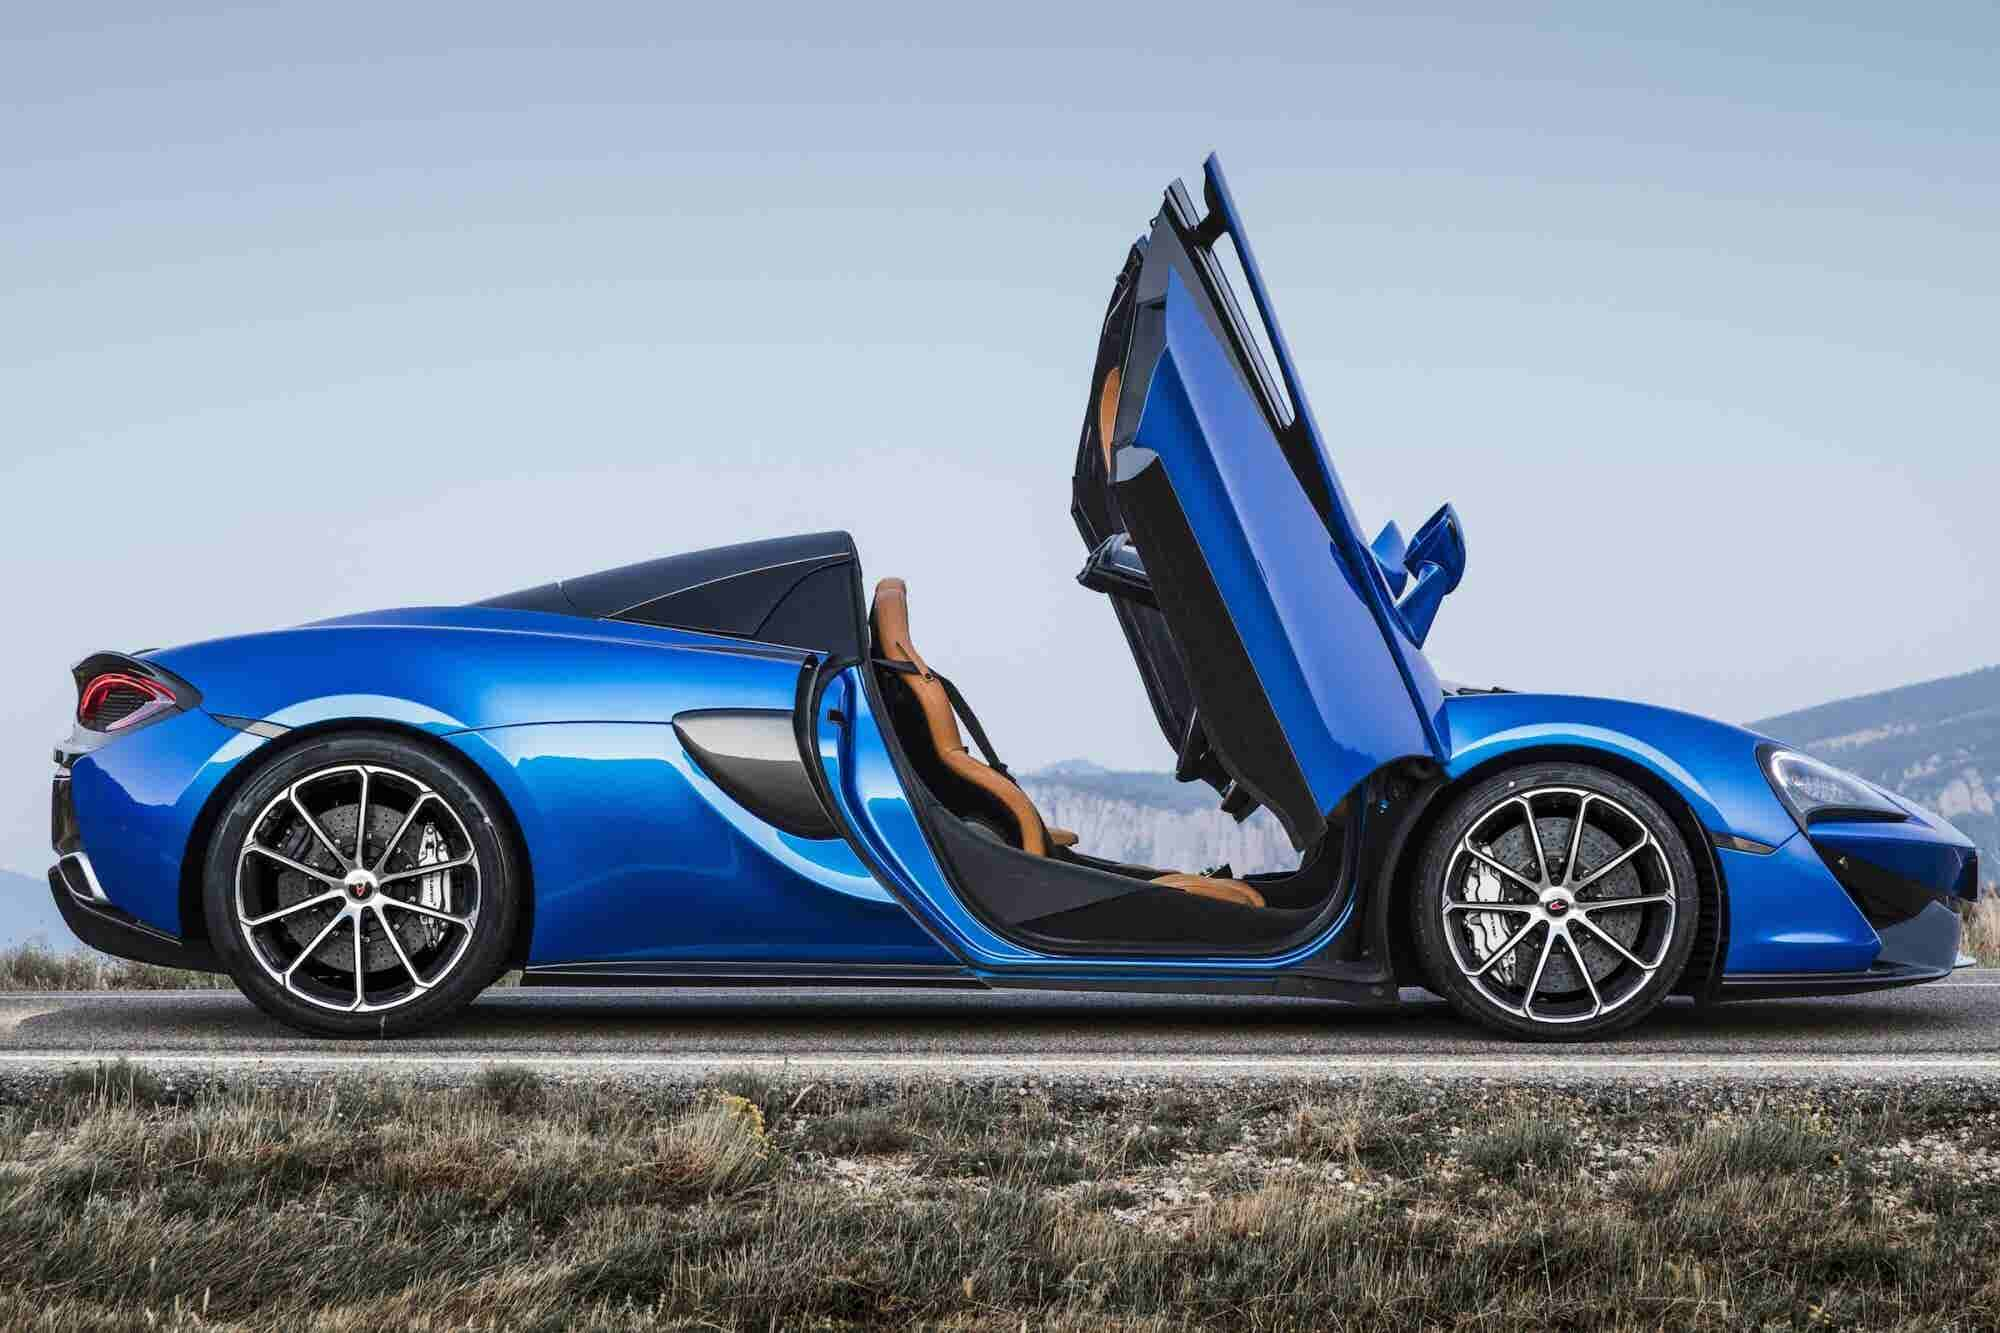 Bucking the Trend, British Supercar Manufacturer McLaren Will Not Build an SUV